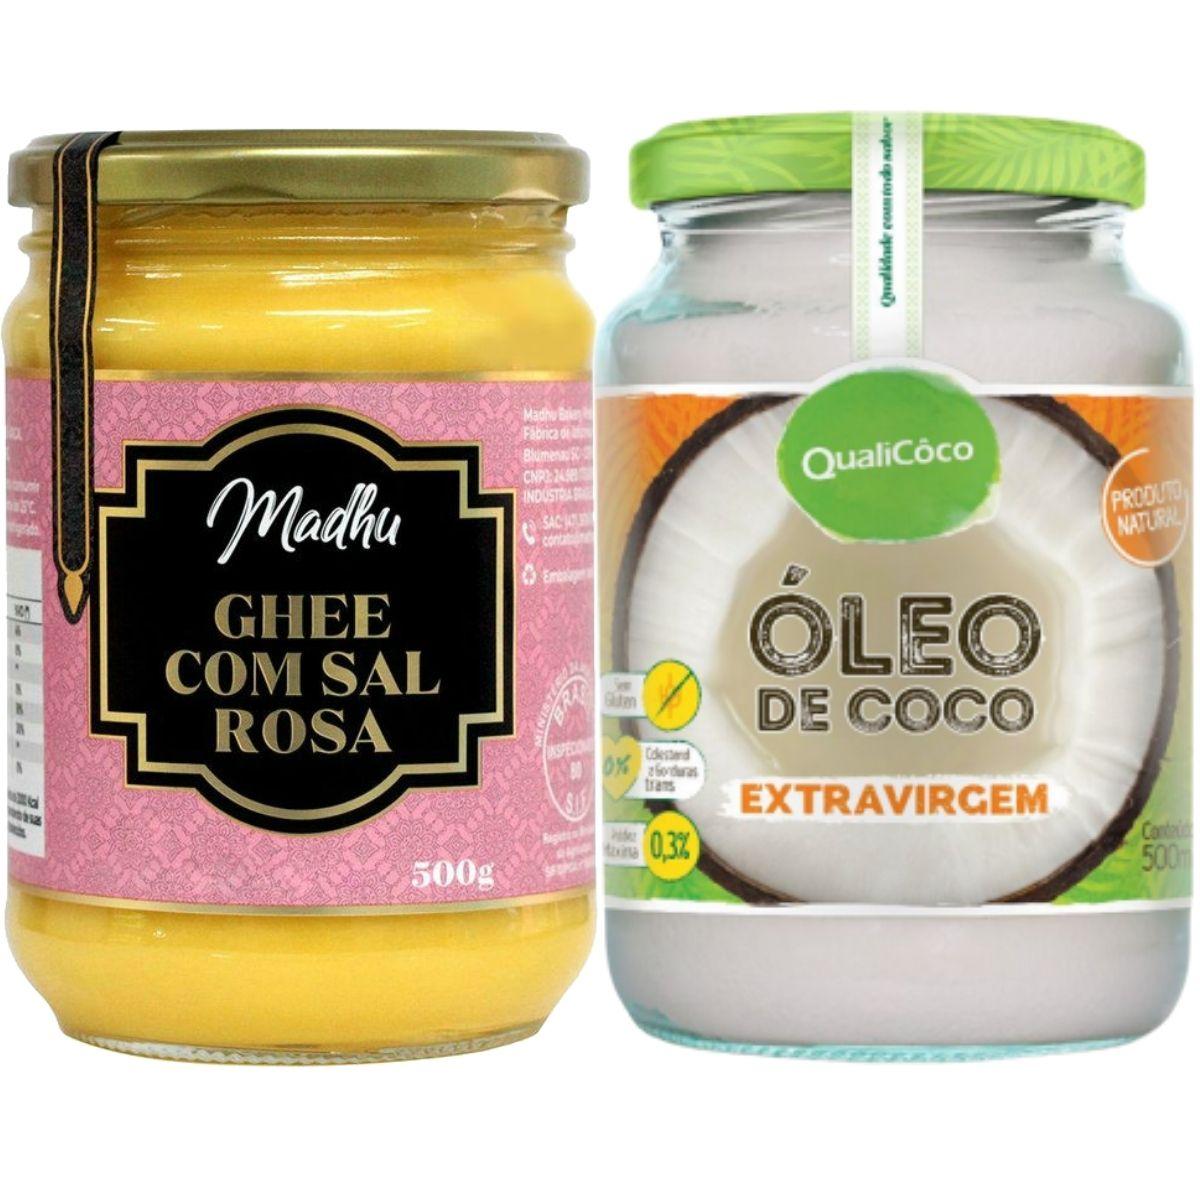 Kit Oleo De Coco Extra Virgem 500ml + Manteiga Ghee Clarificada C/ Sal Rosa 500g